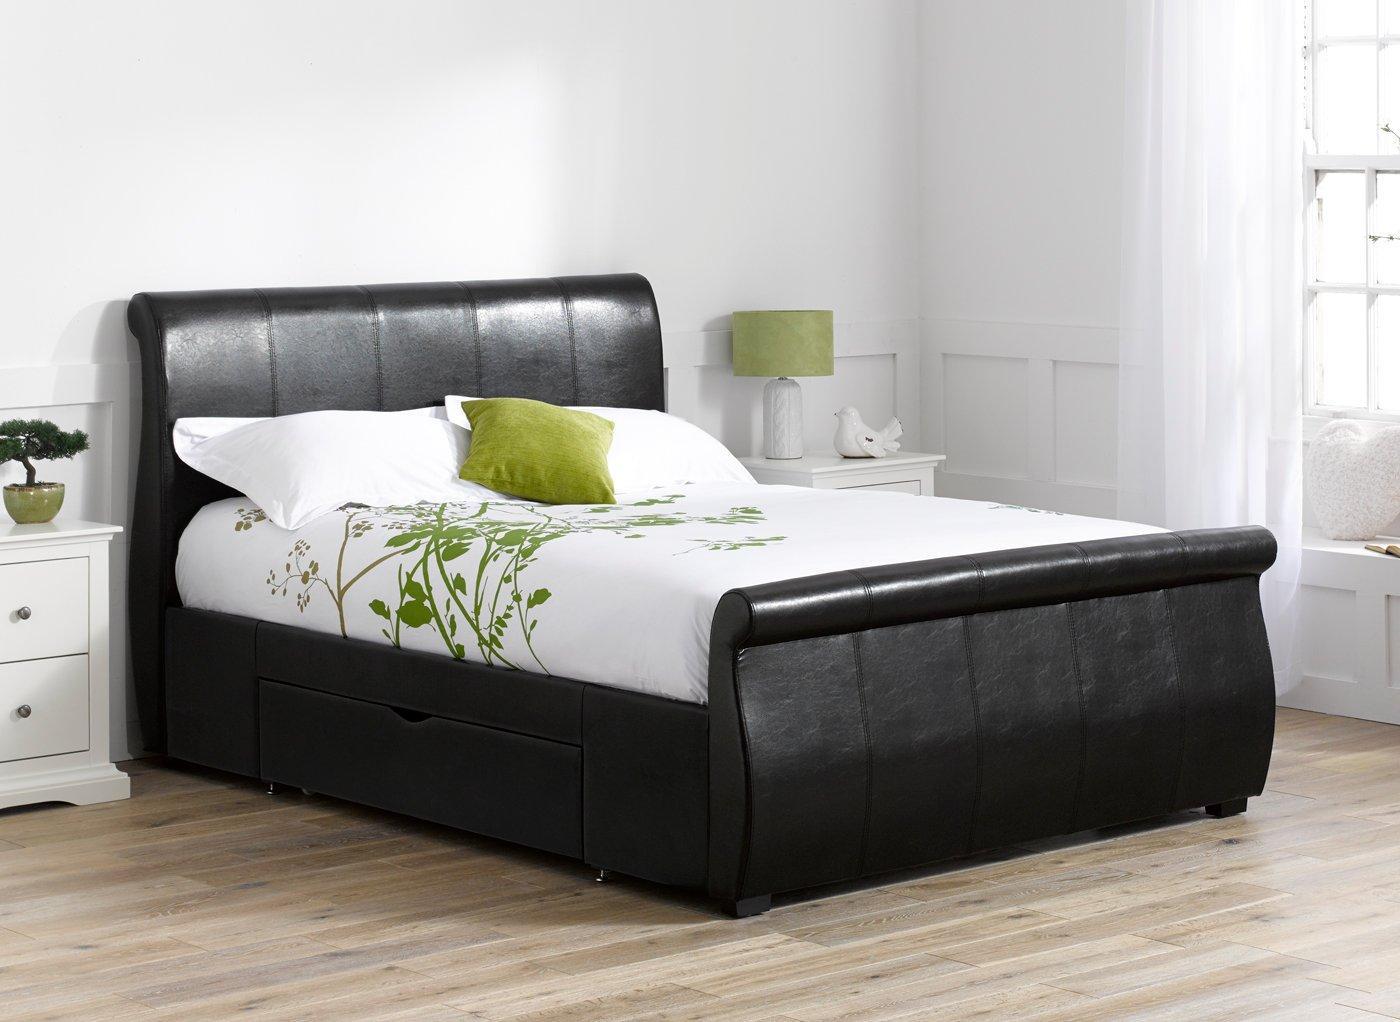 Manhattan Black Bonded Leather Upholstered Bed Frame 5'0 King